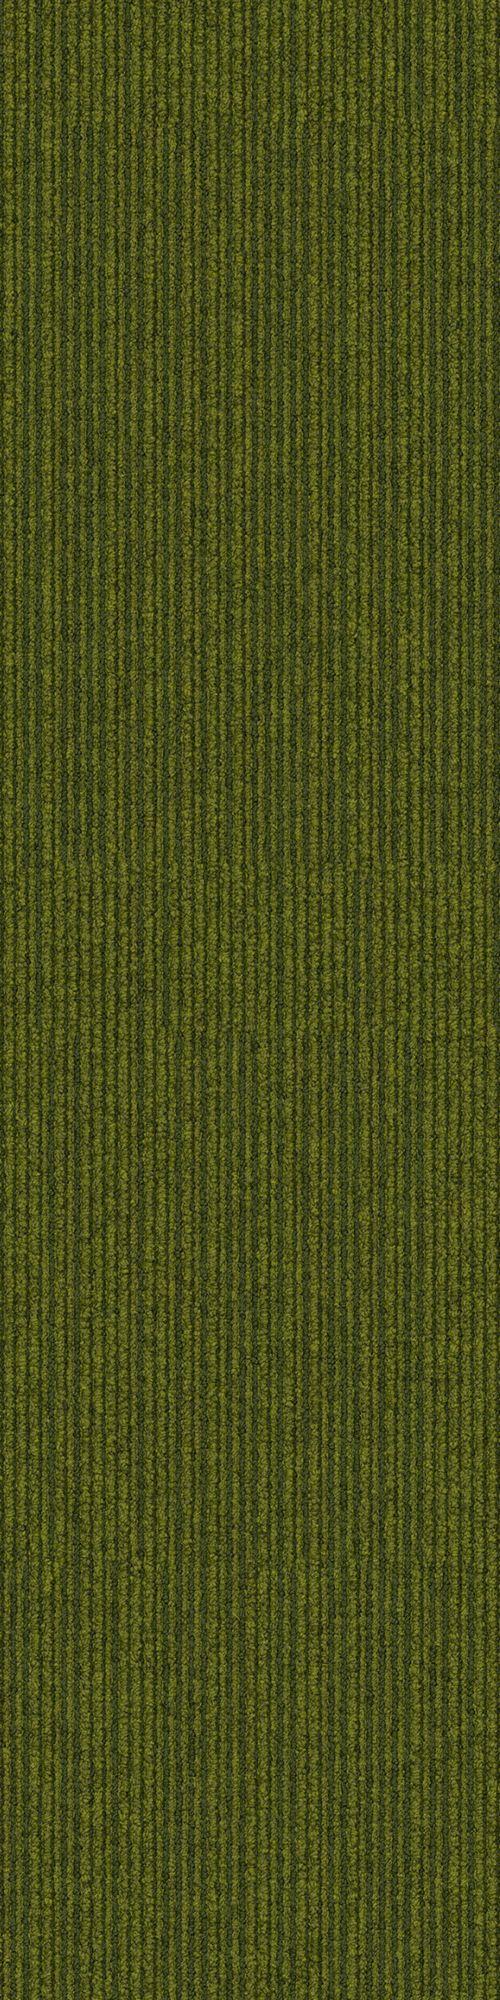 Interface carpet tile: On Line Color name: Grass